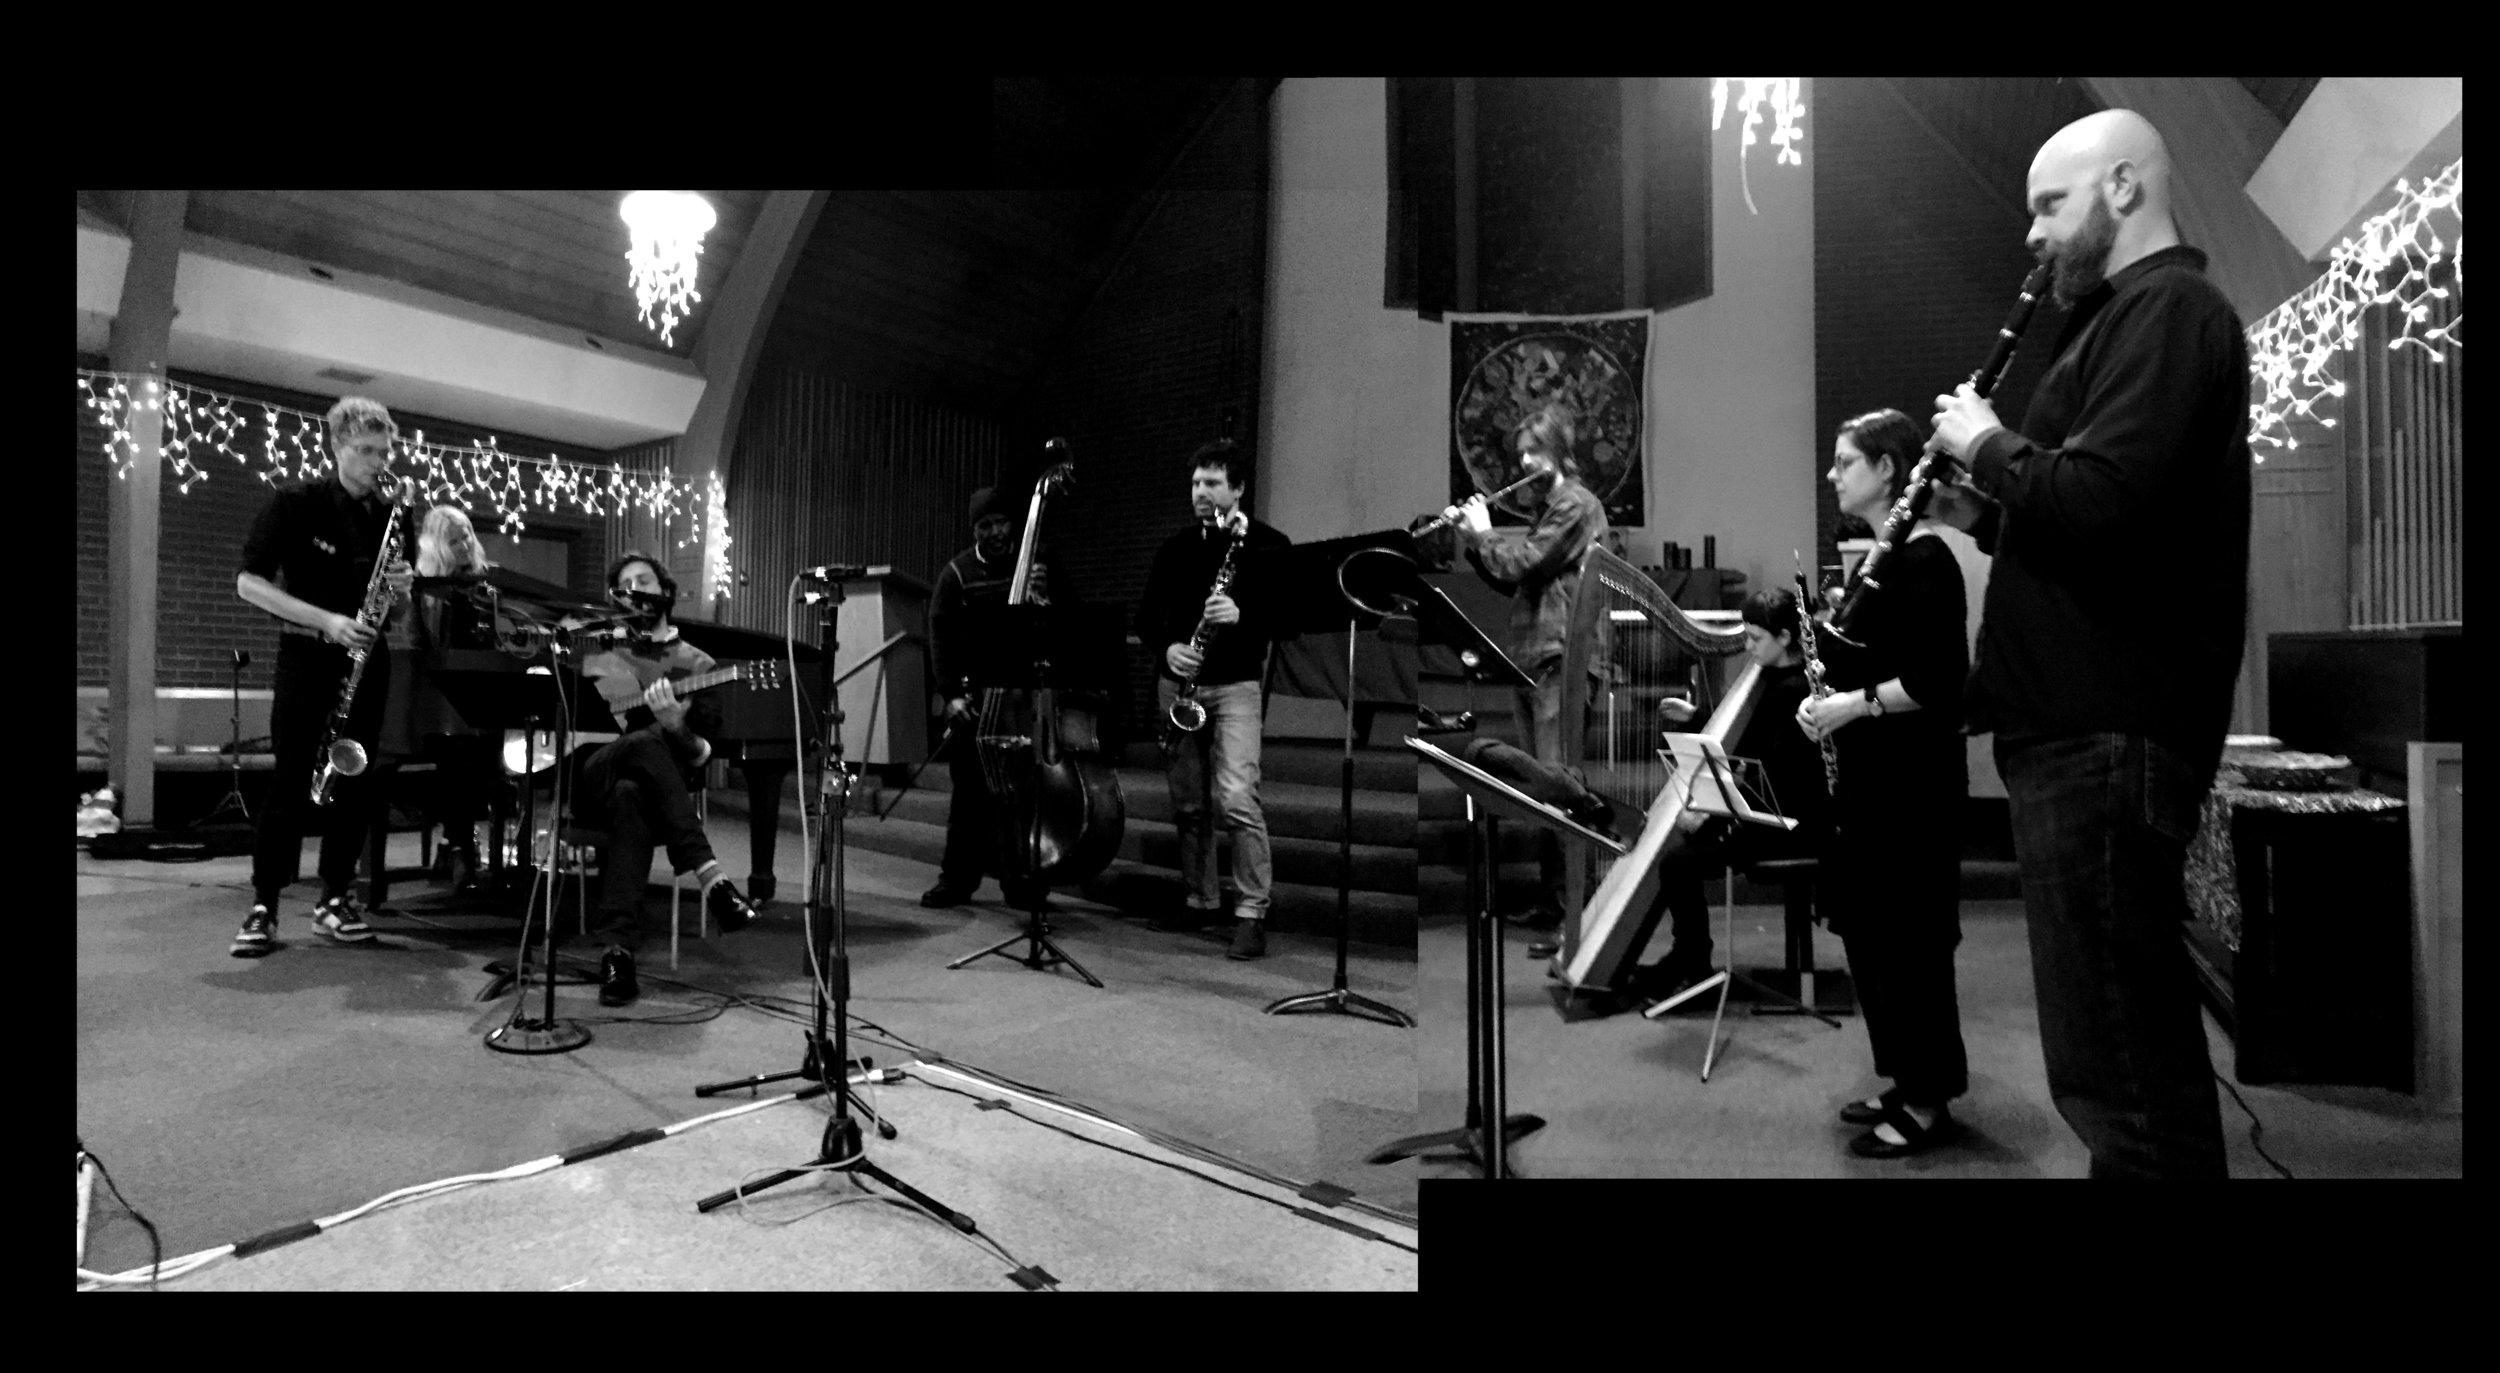 Eva-Maria Houben - la solenite des silences (2005)